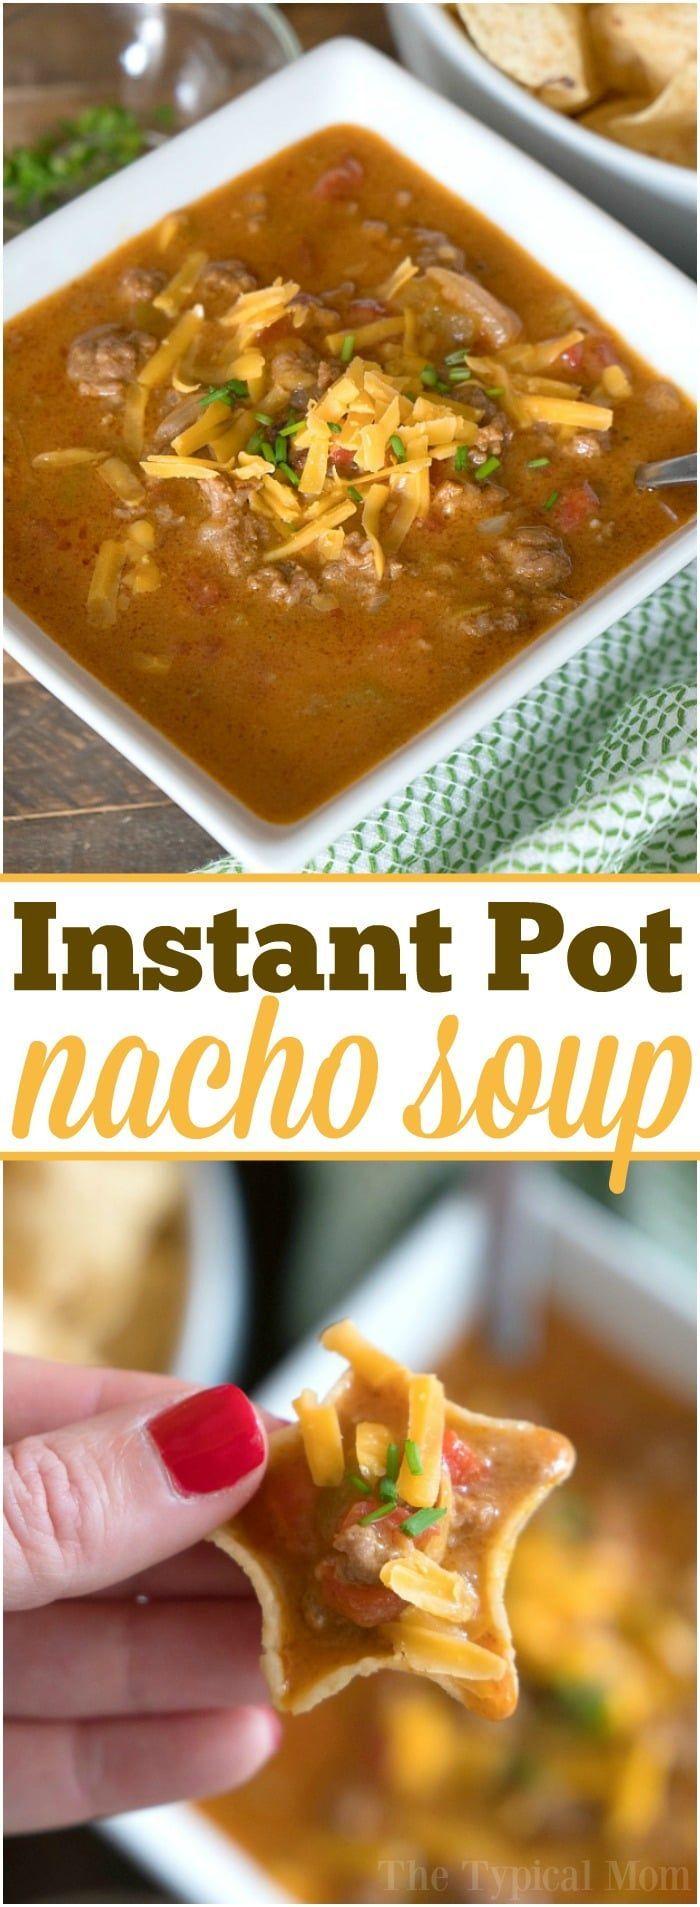 Instant pot nacho soup | Posted By: DebbieNet.com